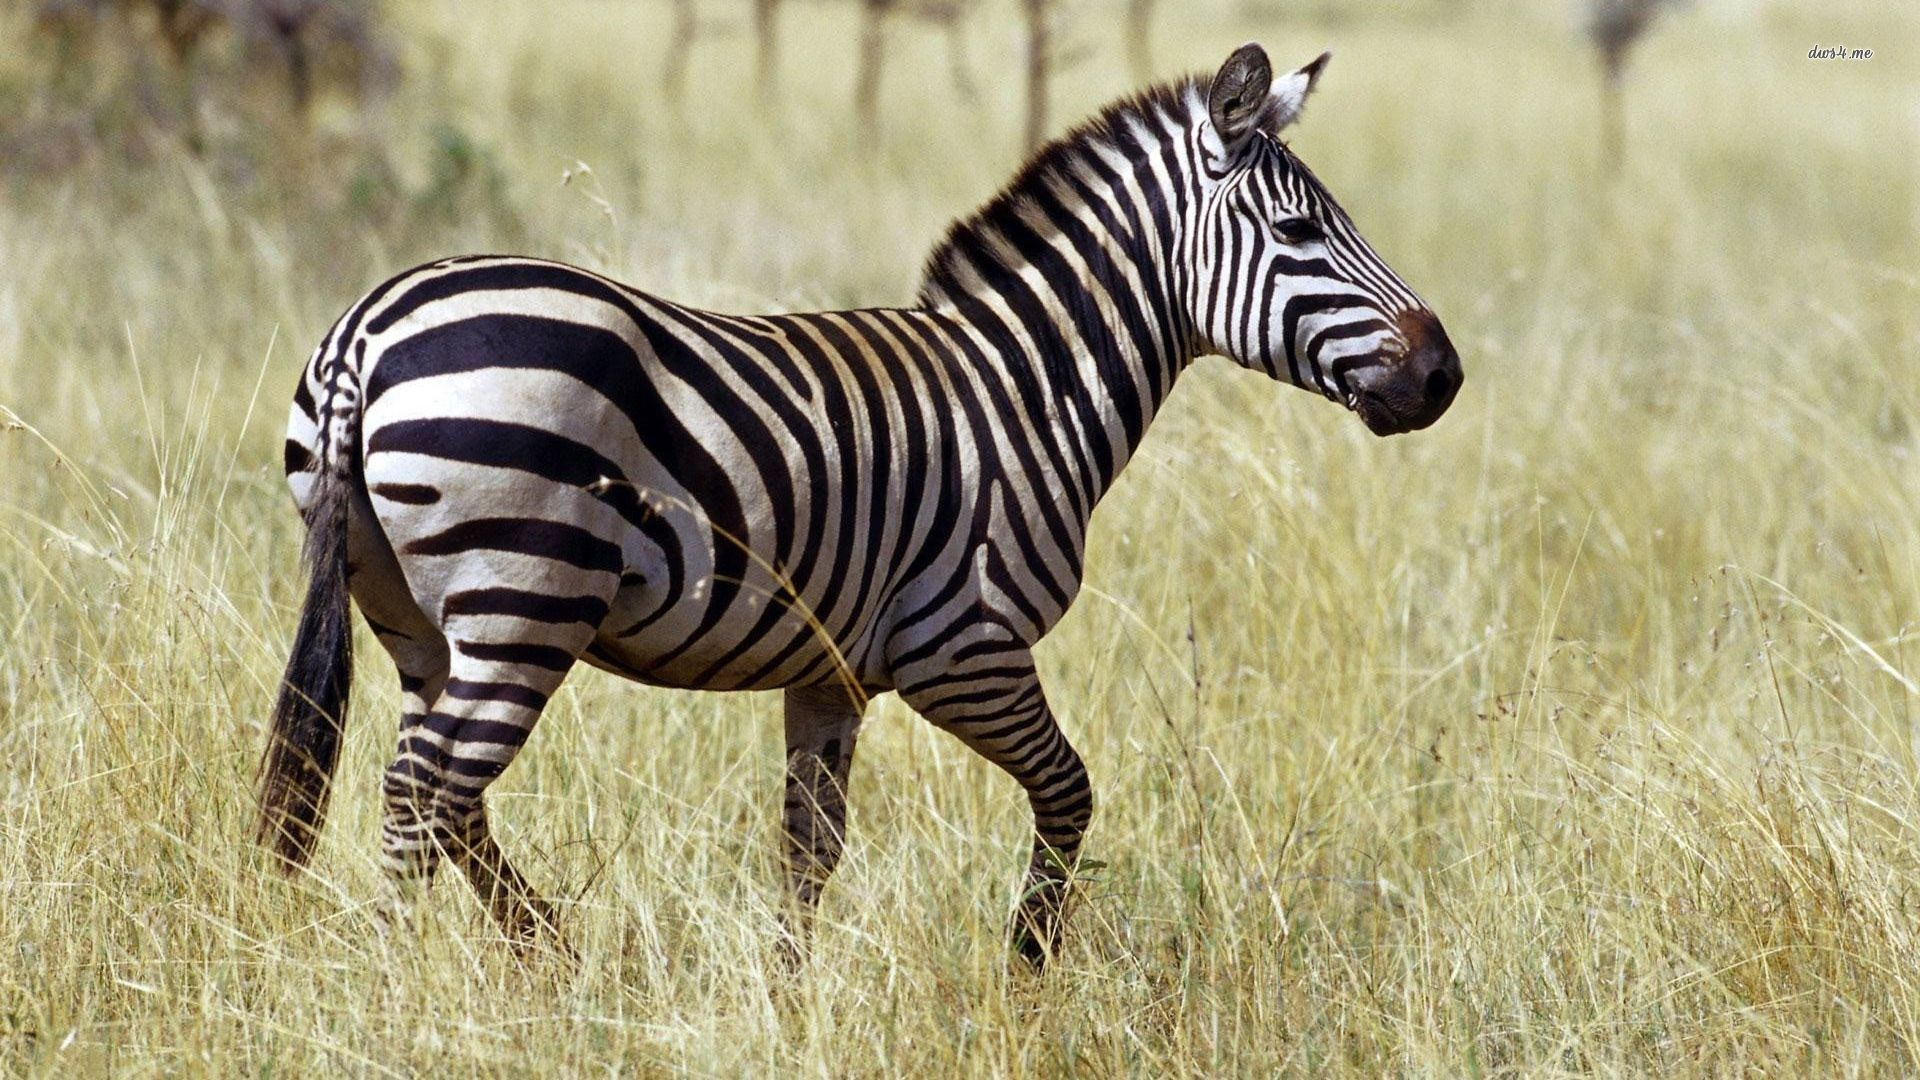 zebra images wallpapers hd Zebra wallpaper, Zebra, Wallpaper